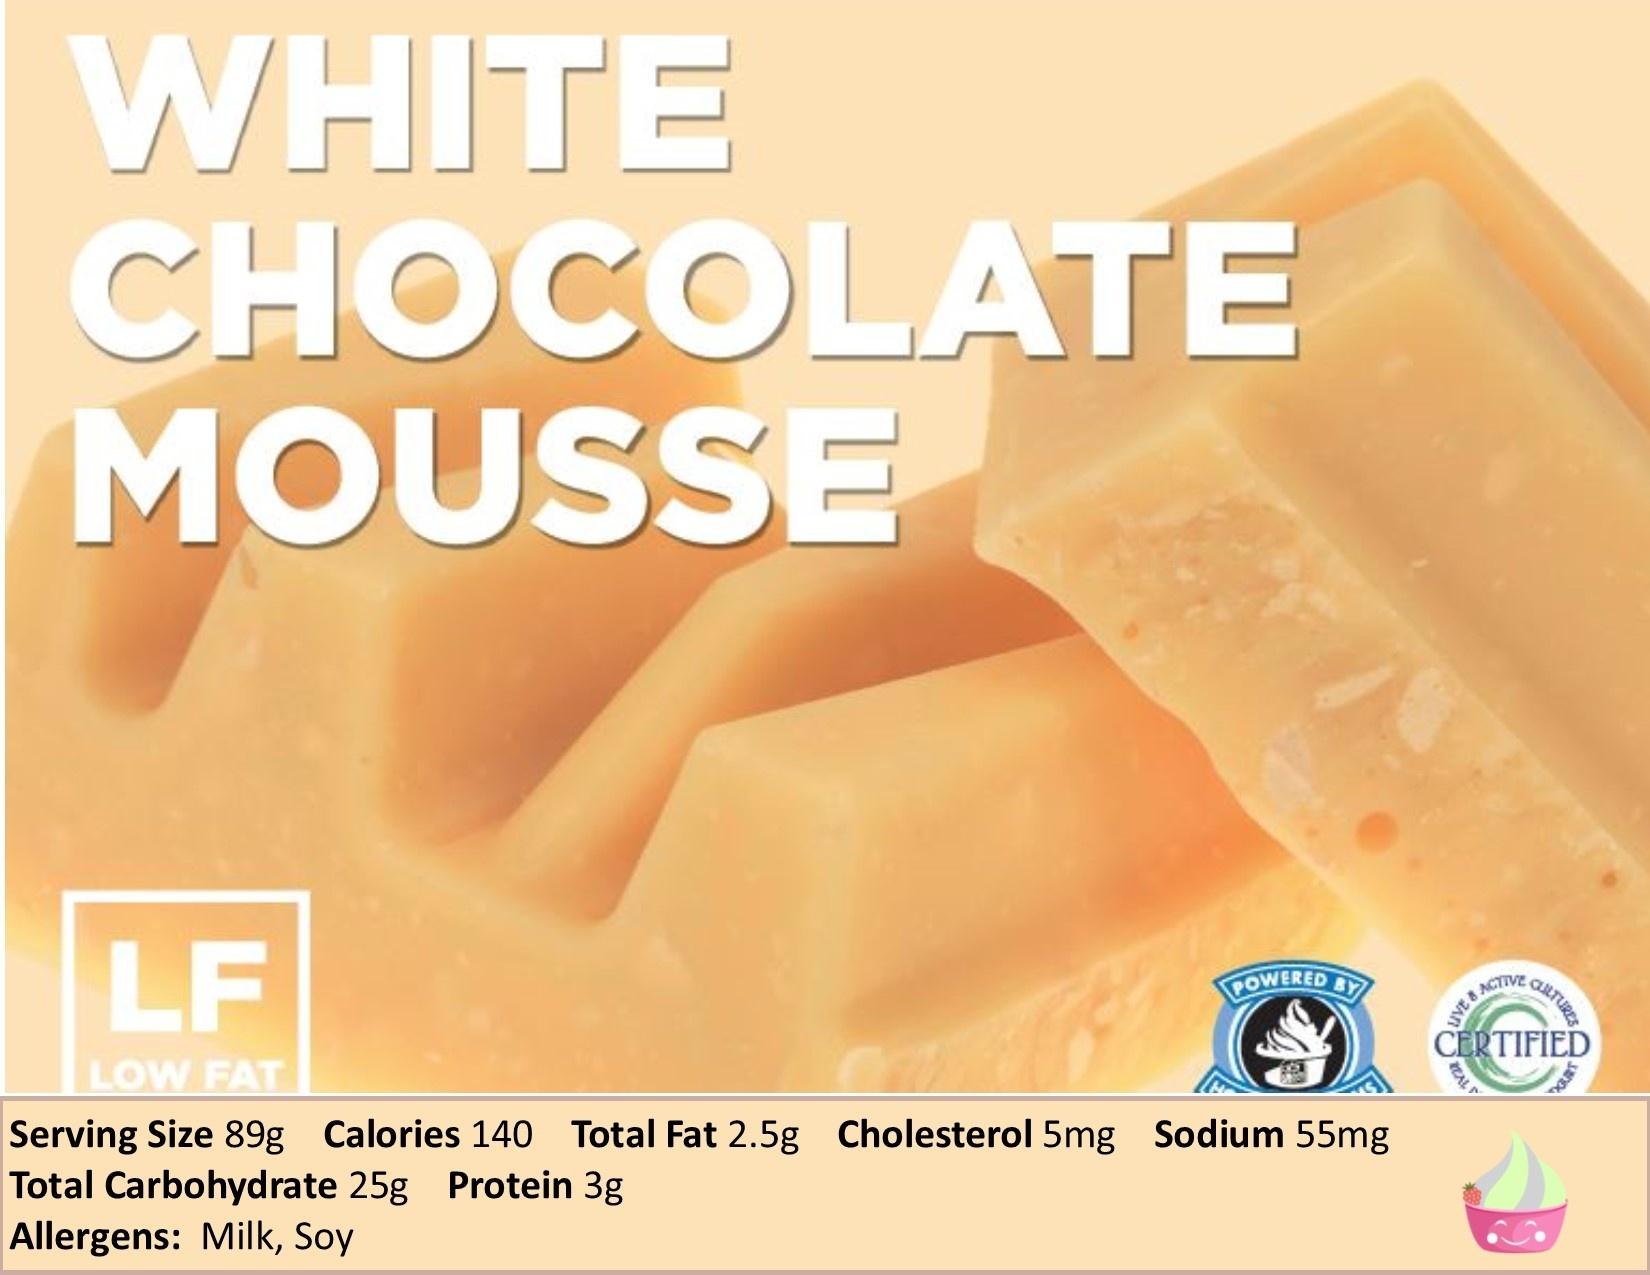 https://0201.nccdn.net/1_2/000/000/0eb/ff6/White-Chocolate-Mousse-LF-1650x1275-1650x1275.jpg